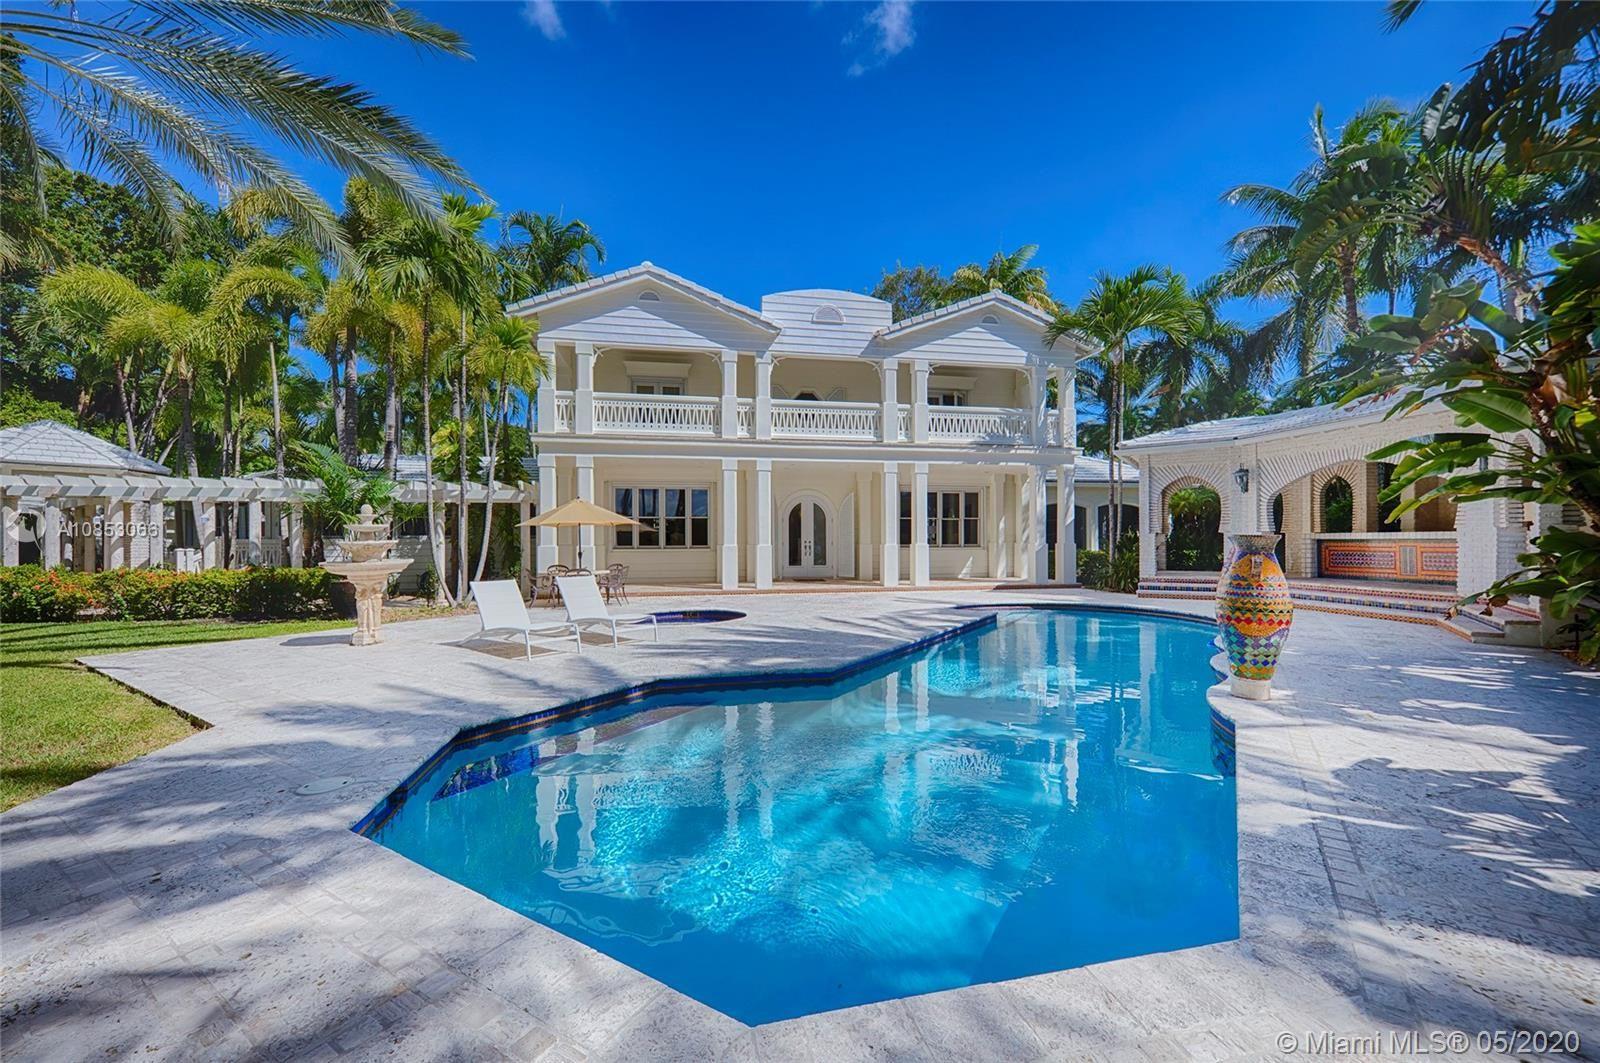 Photo 4 of Listing MLS a10853066 in 1 Star Island Dr Miami Beach FL 33139